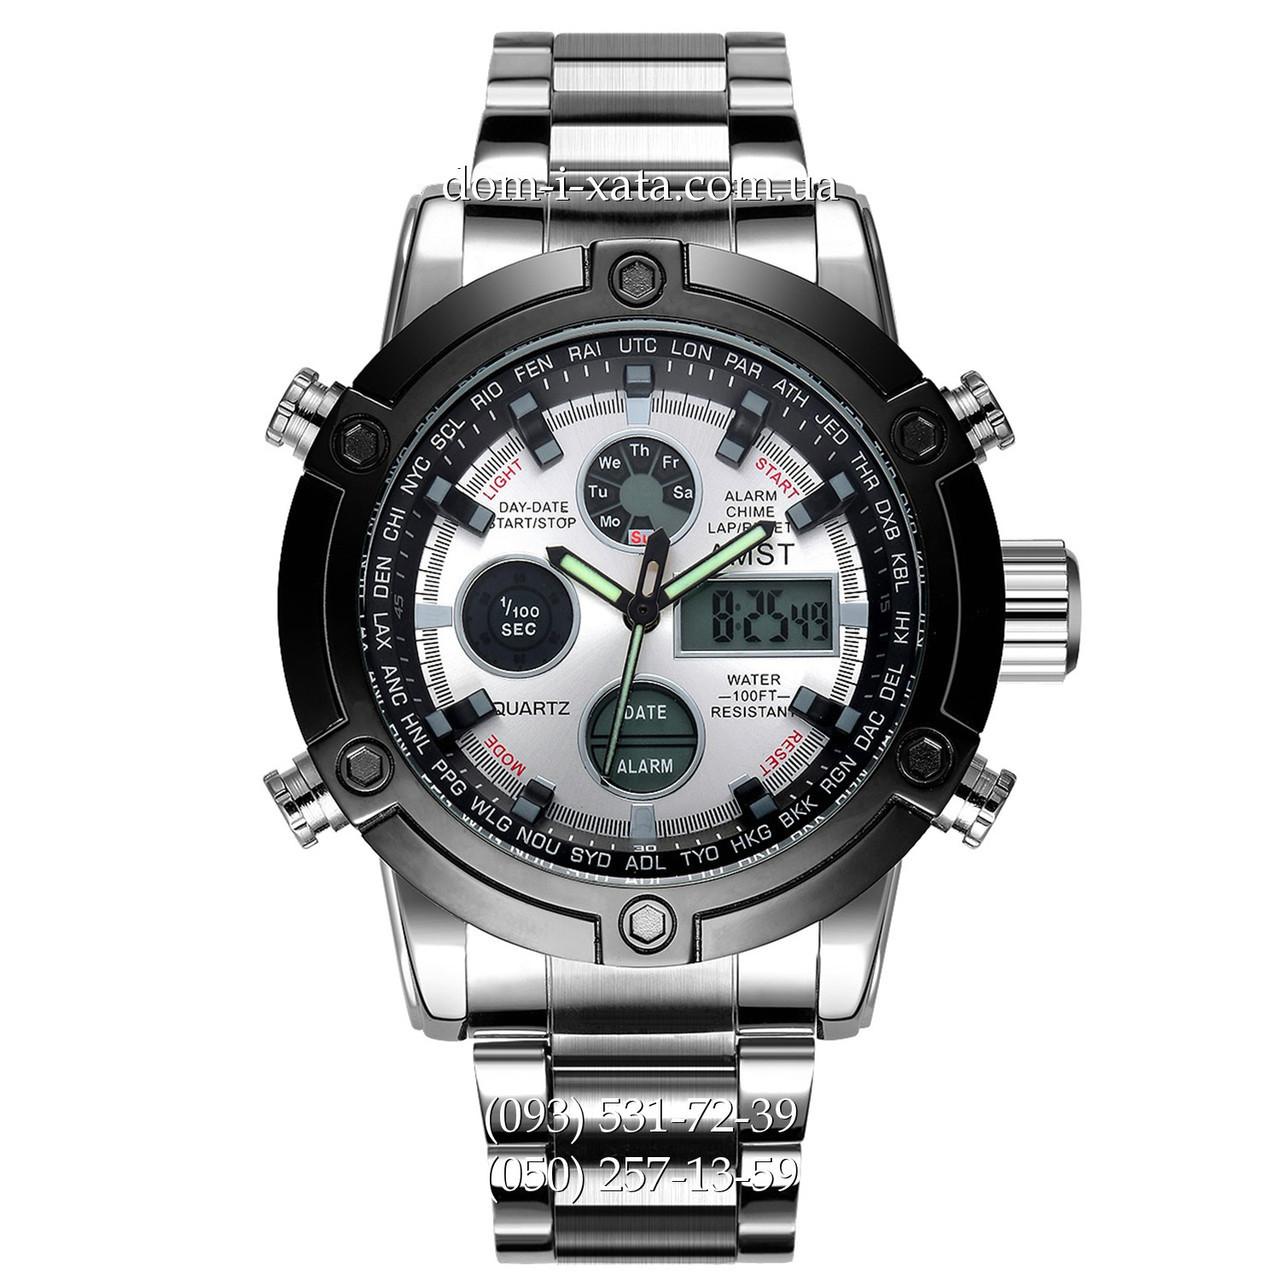 Армейские часы AMST 3022 Metall Silver-Black-Silver, кварцевые, противоударные, армейские часы АМСТ, реплика отличное качество!